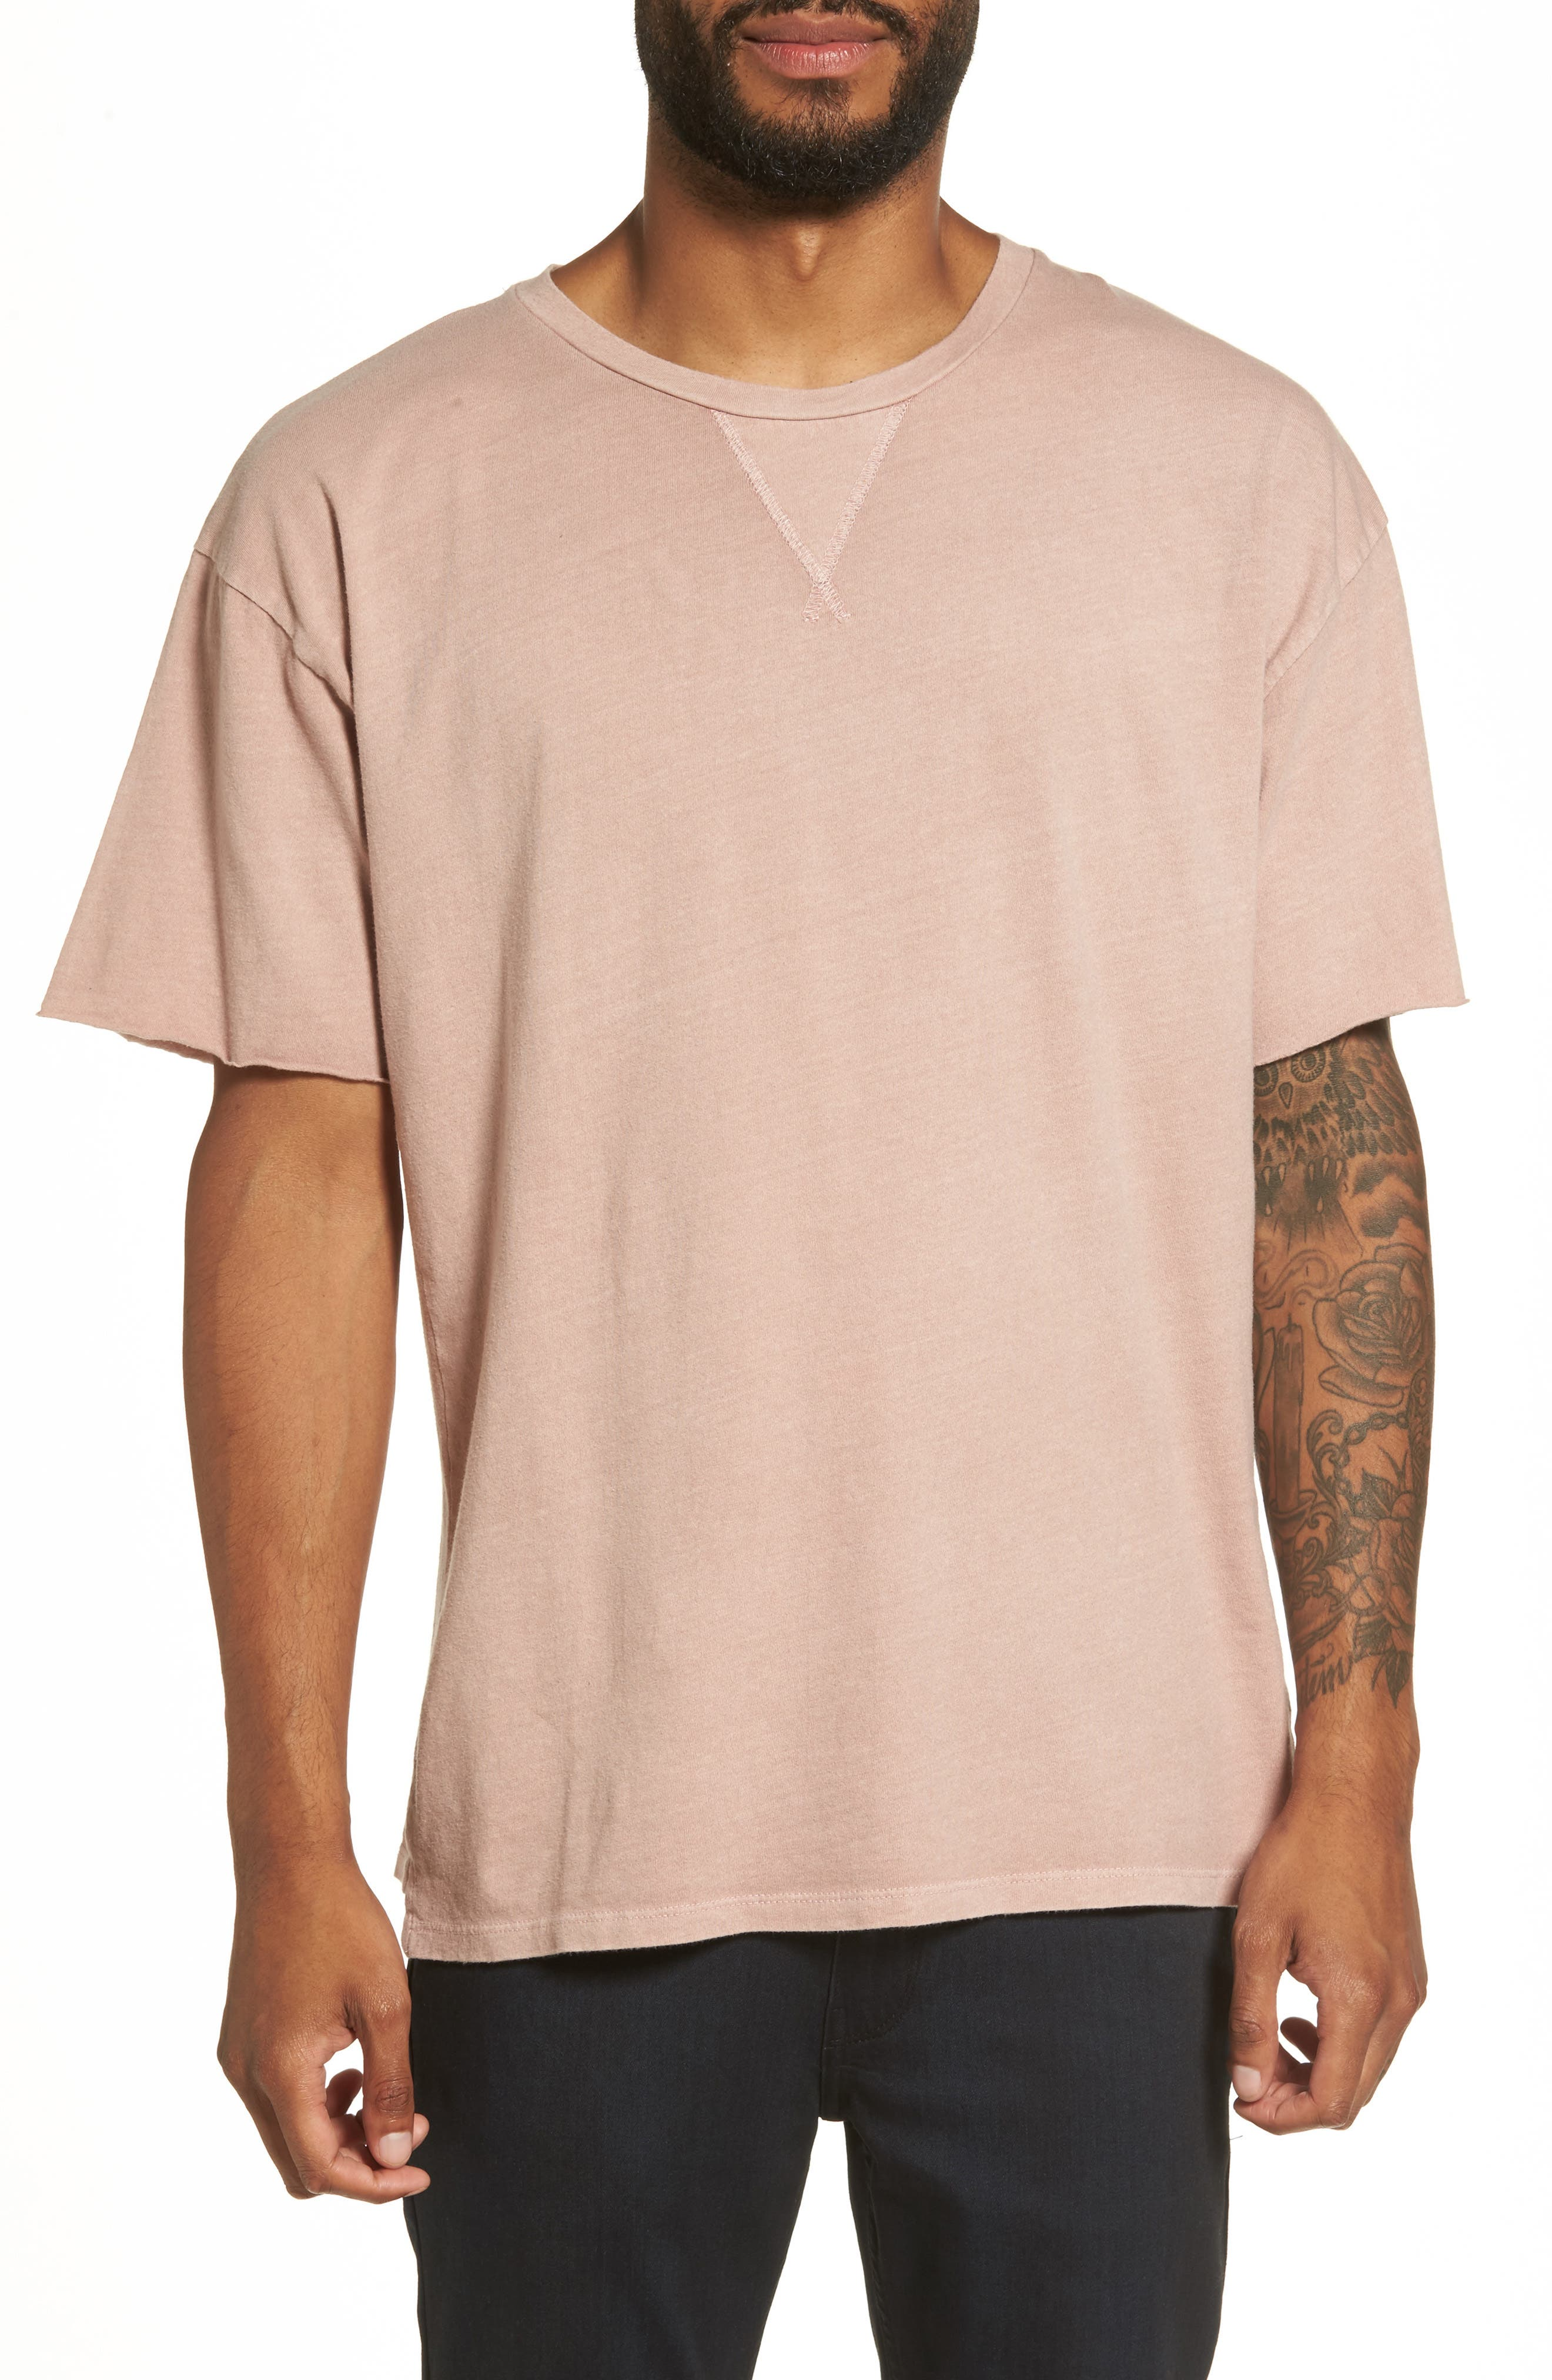 The Rail Mineral Wash T-Shirt